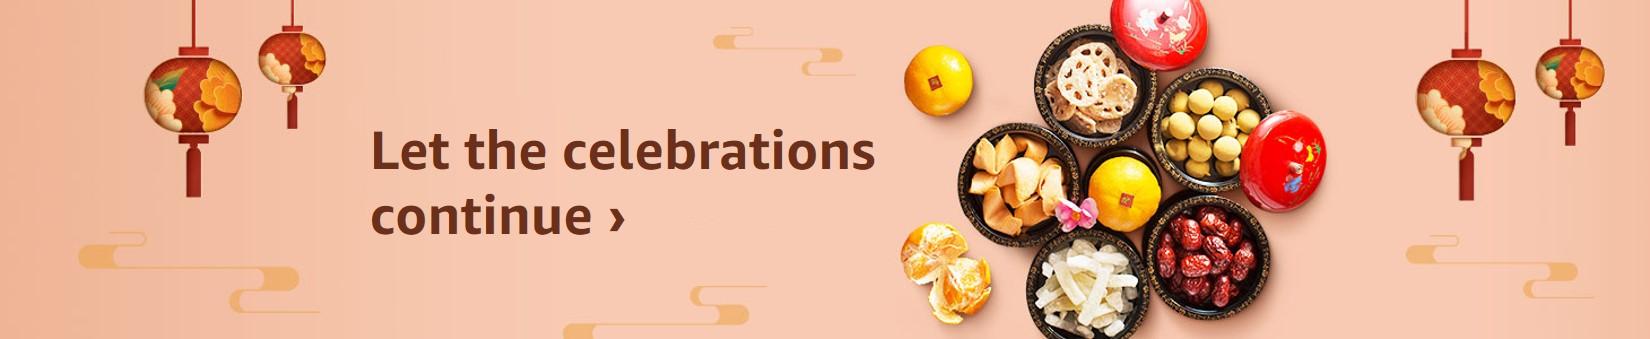 Let the celebrations continue